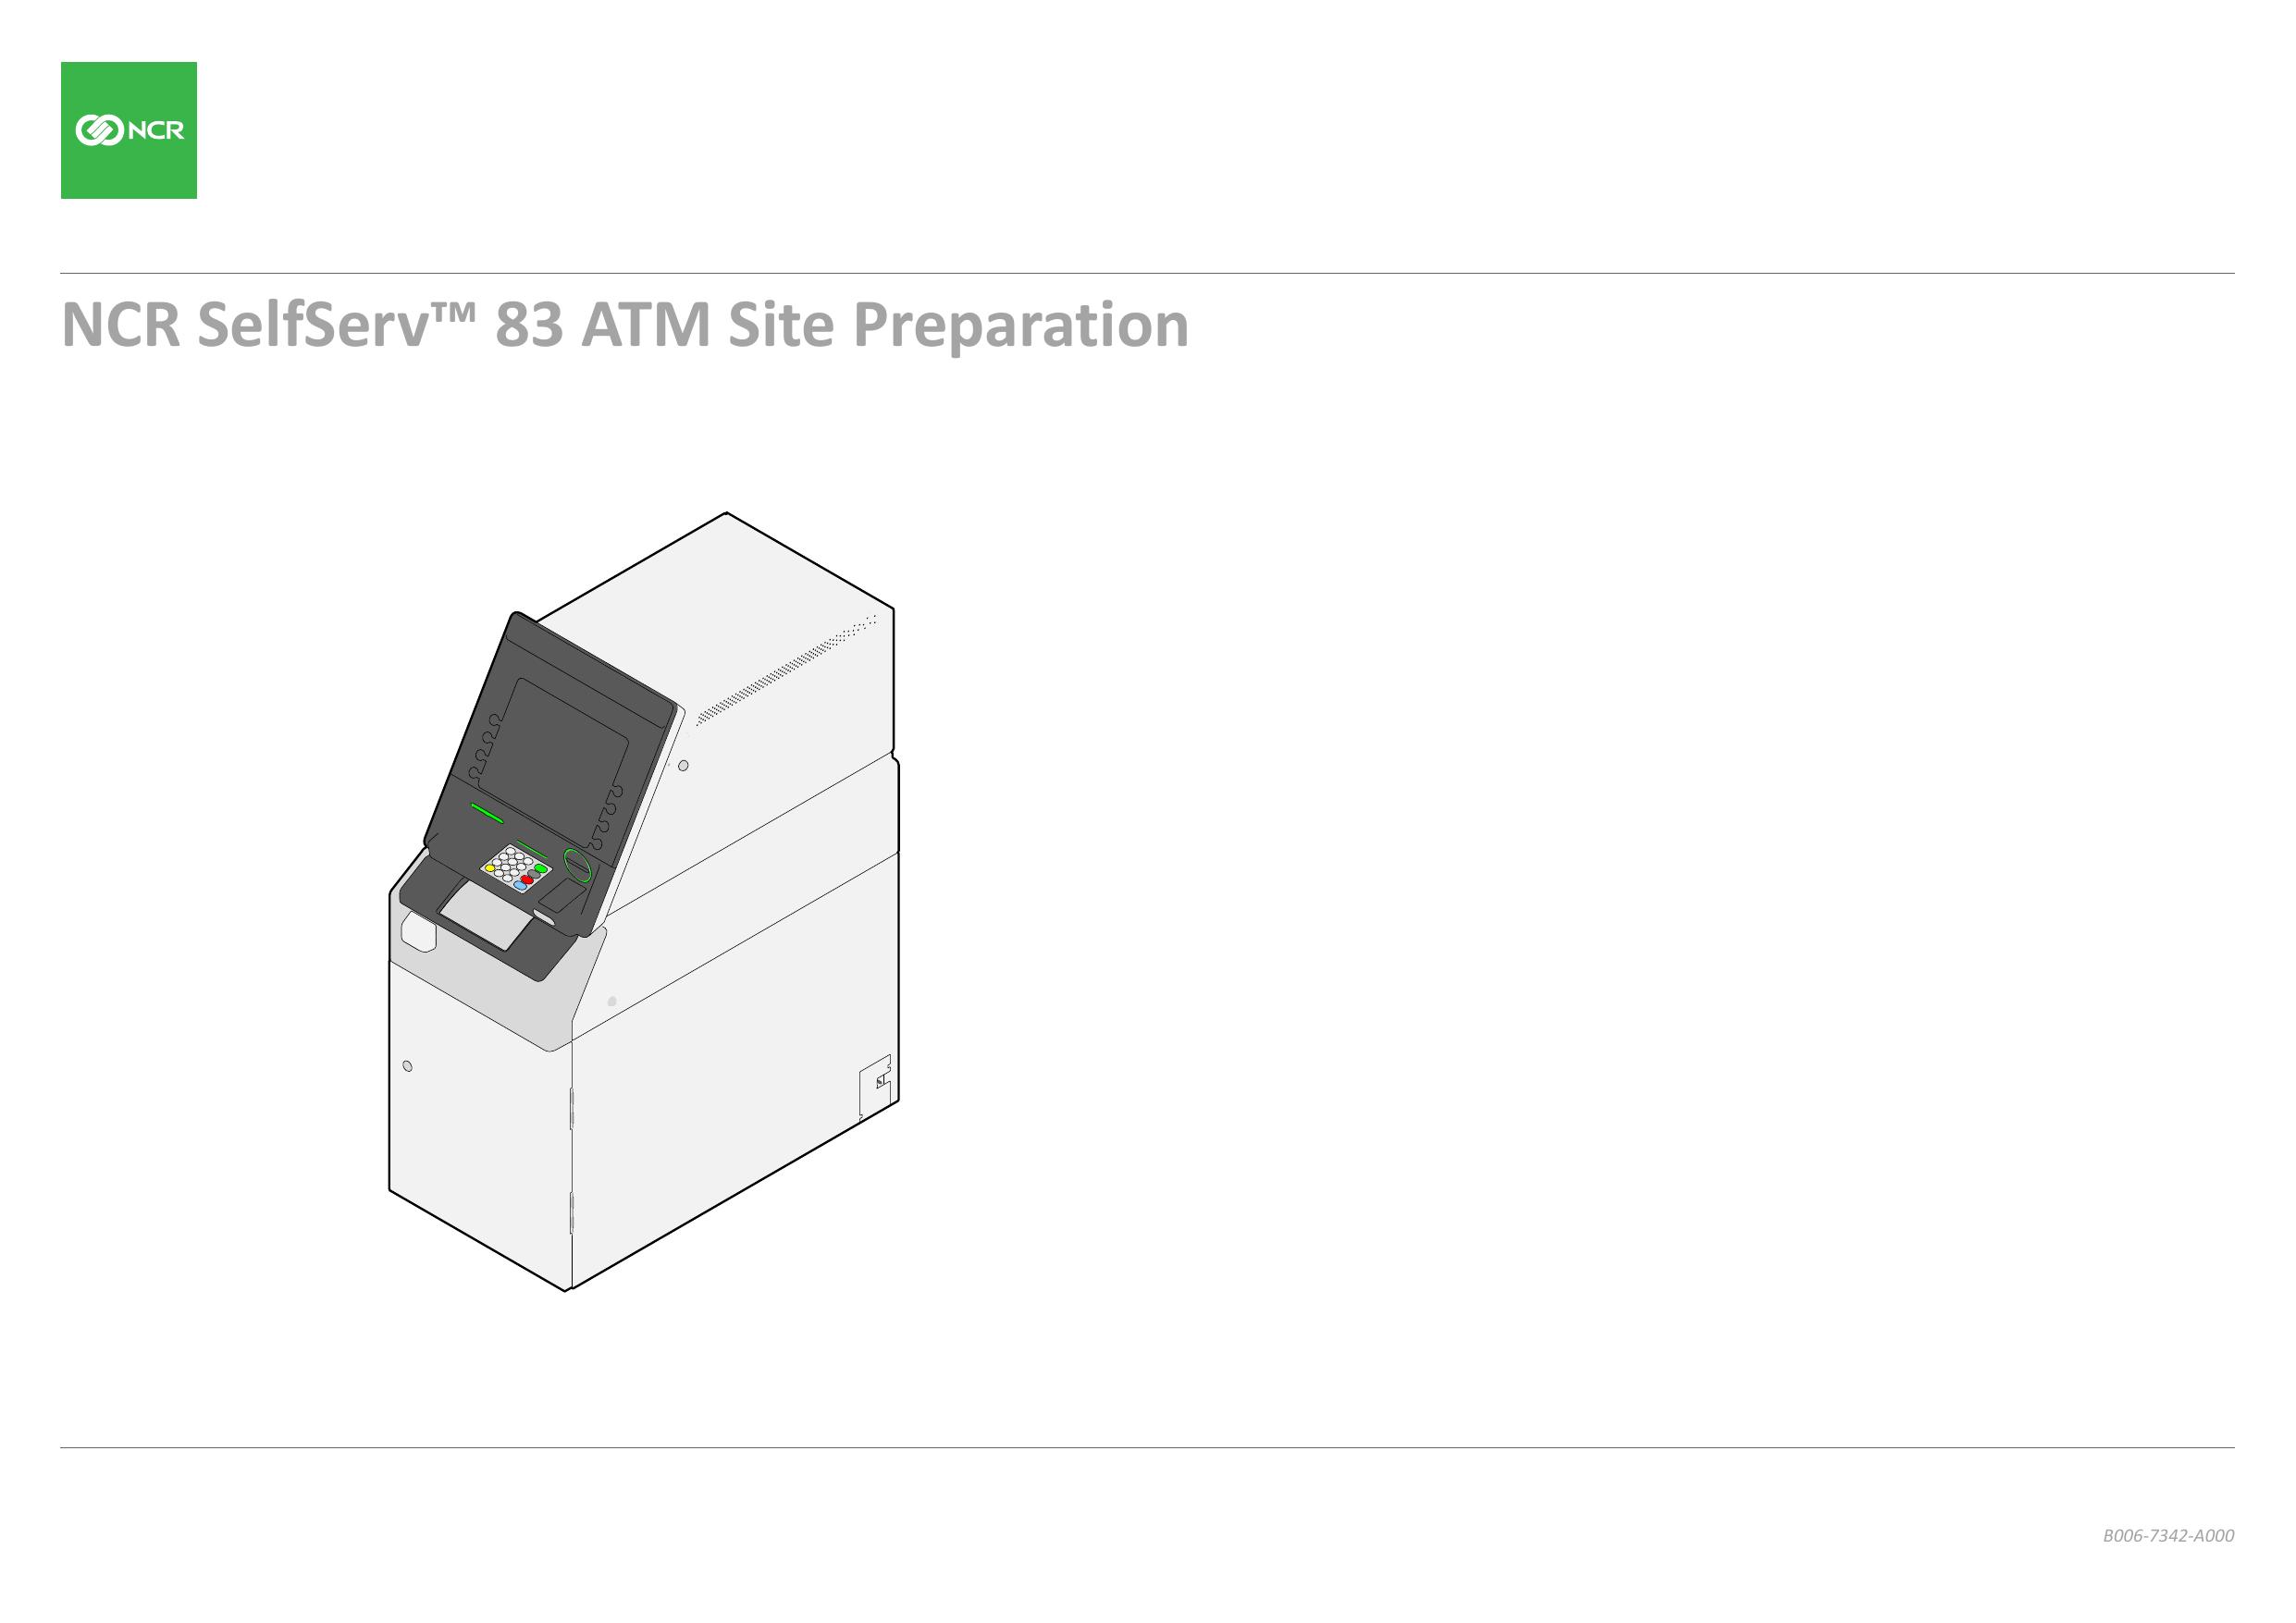 NCR SelfServ™ 83 ATM Site Preparation | manualzz com